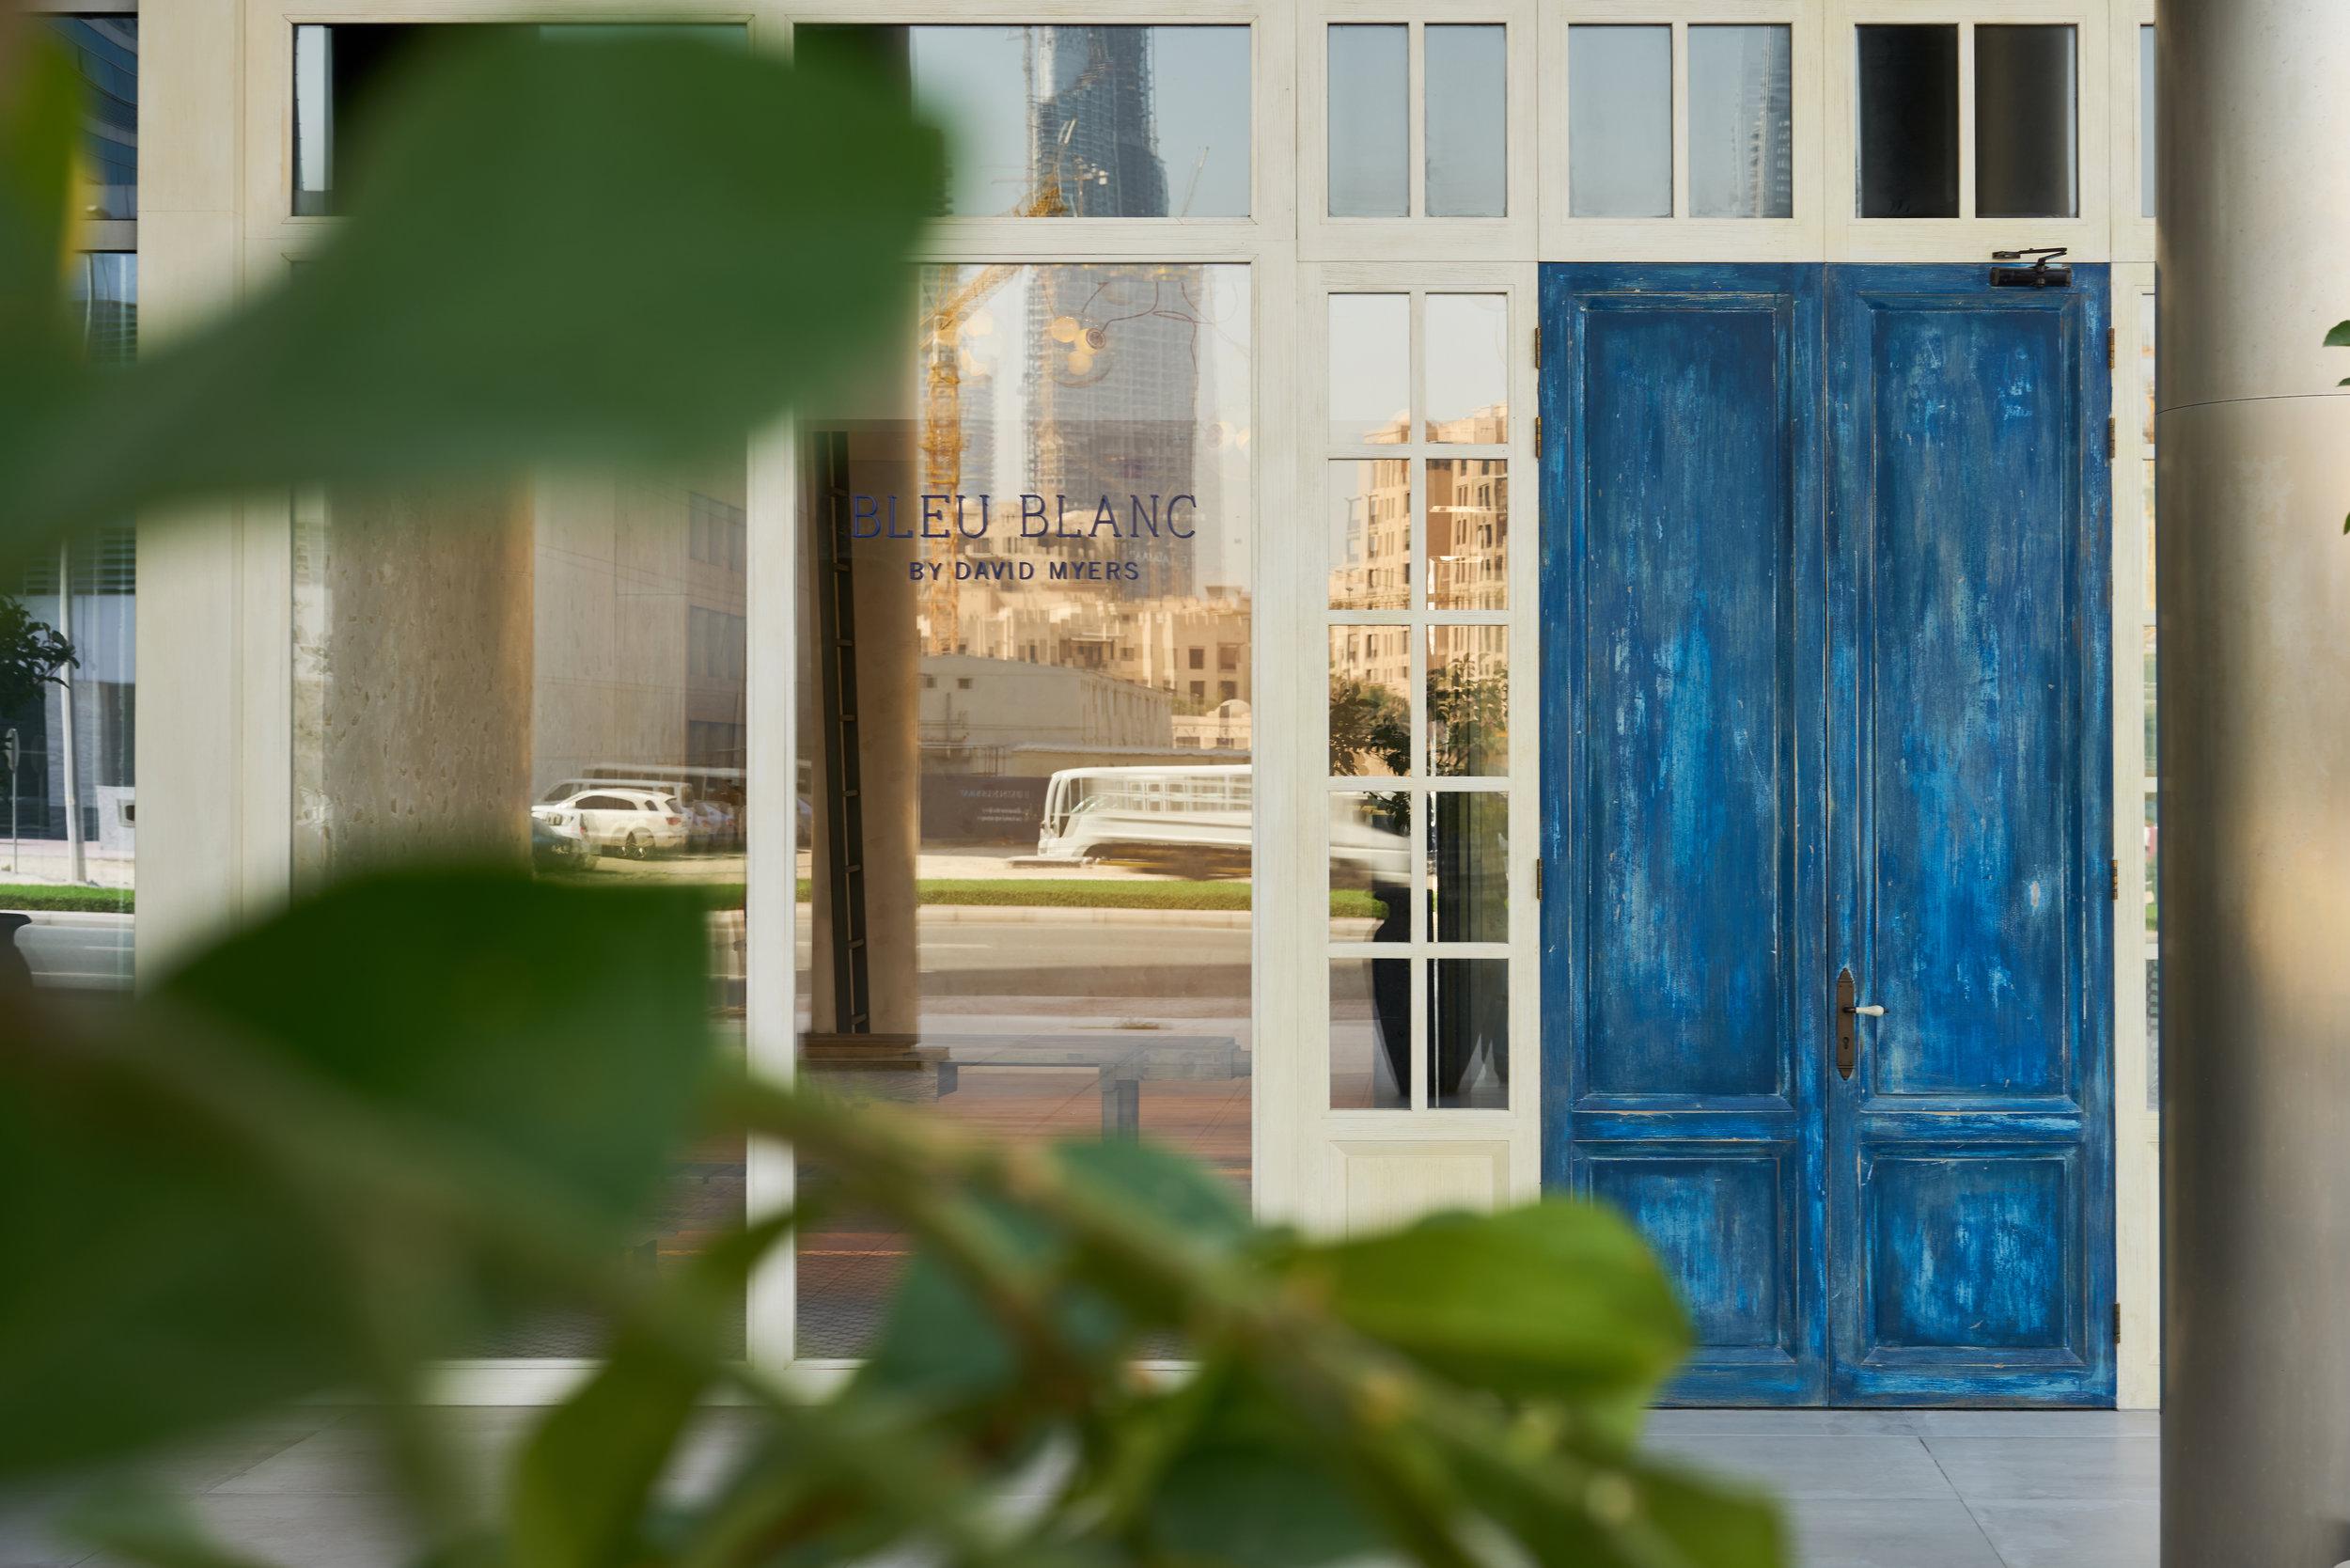 Bleu Blanc | Best Restaurants in Dubai